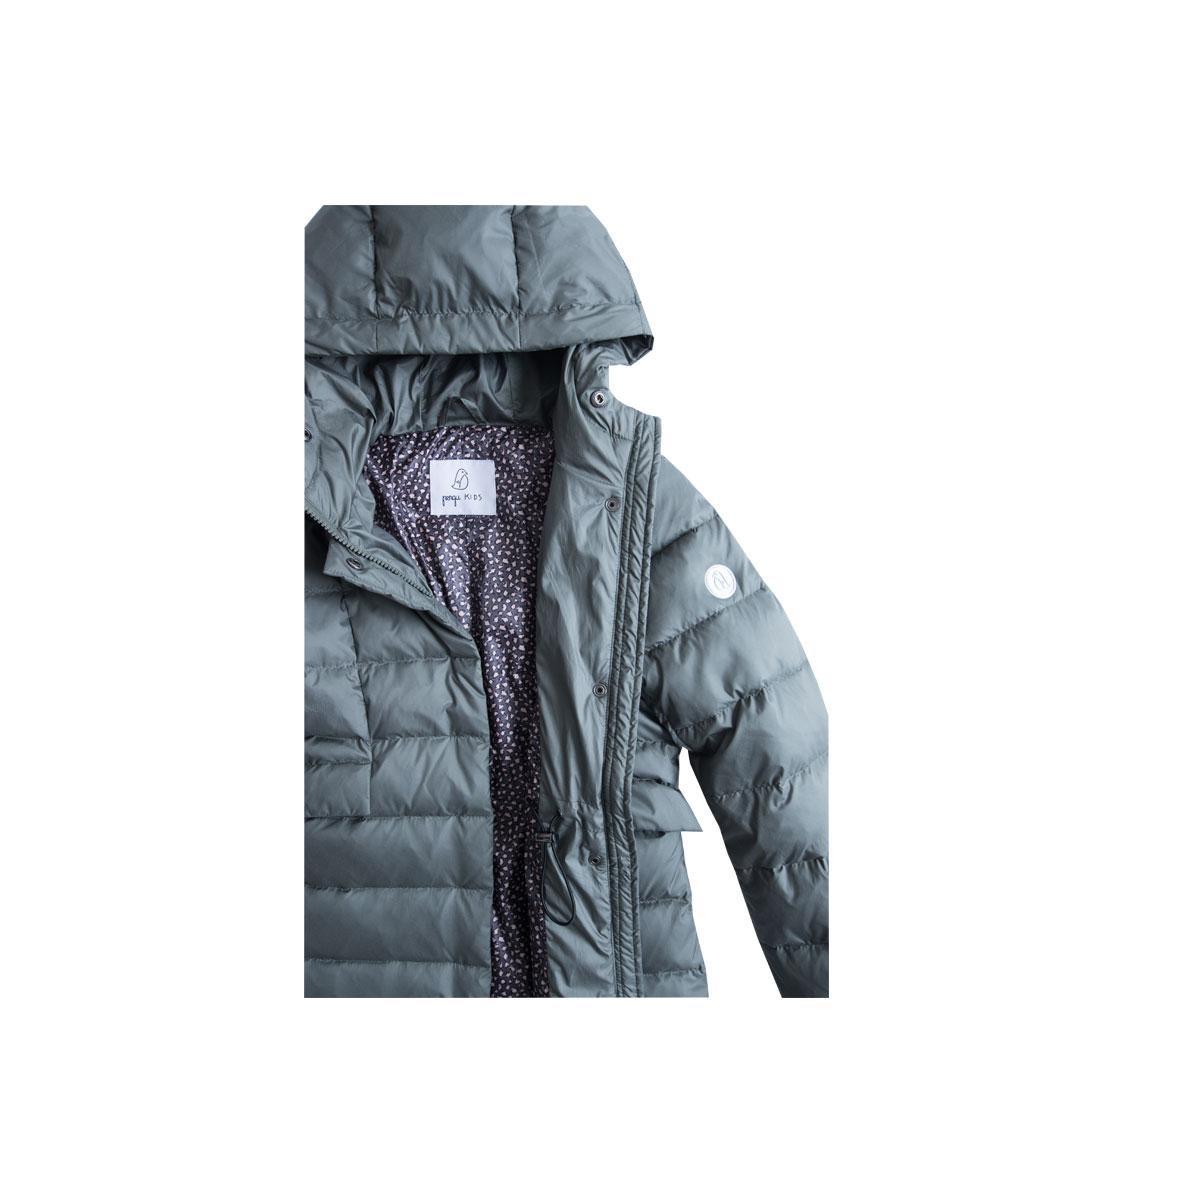 c9966f9d2 Pengu-KIDS-winter-down-coat-kata-khaki-detail | Pengu KIDS